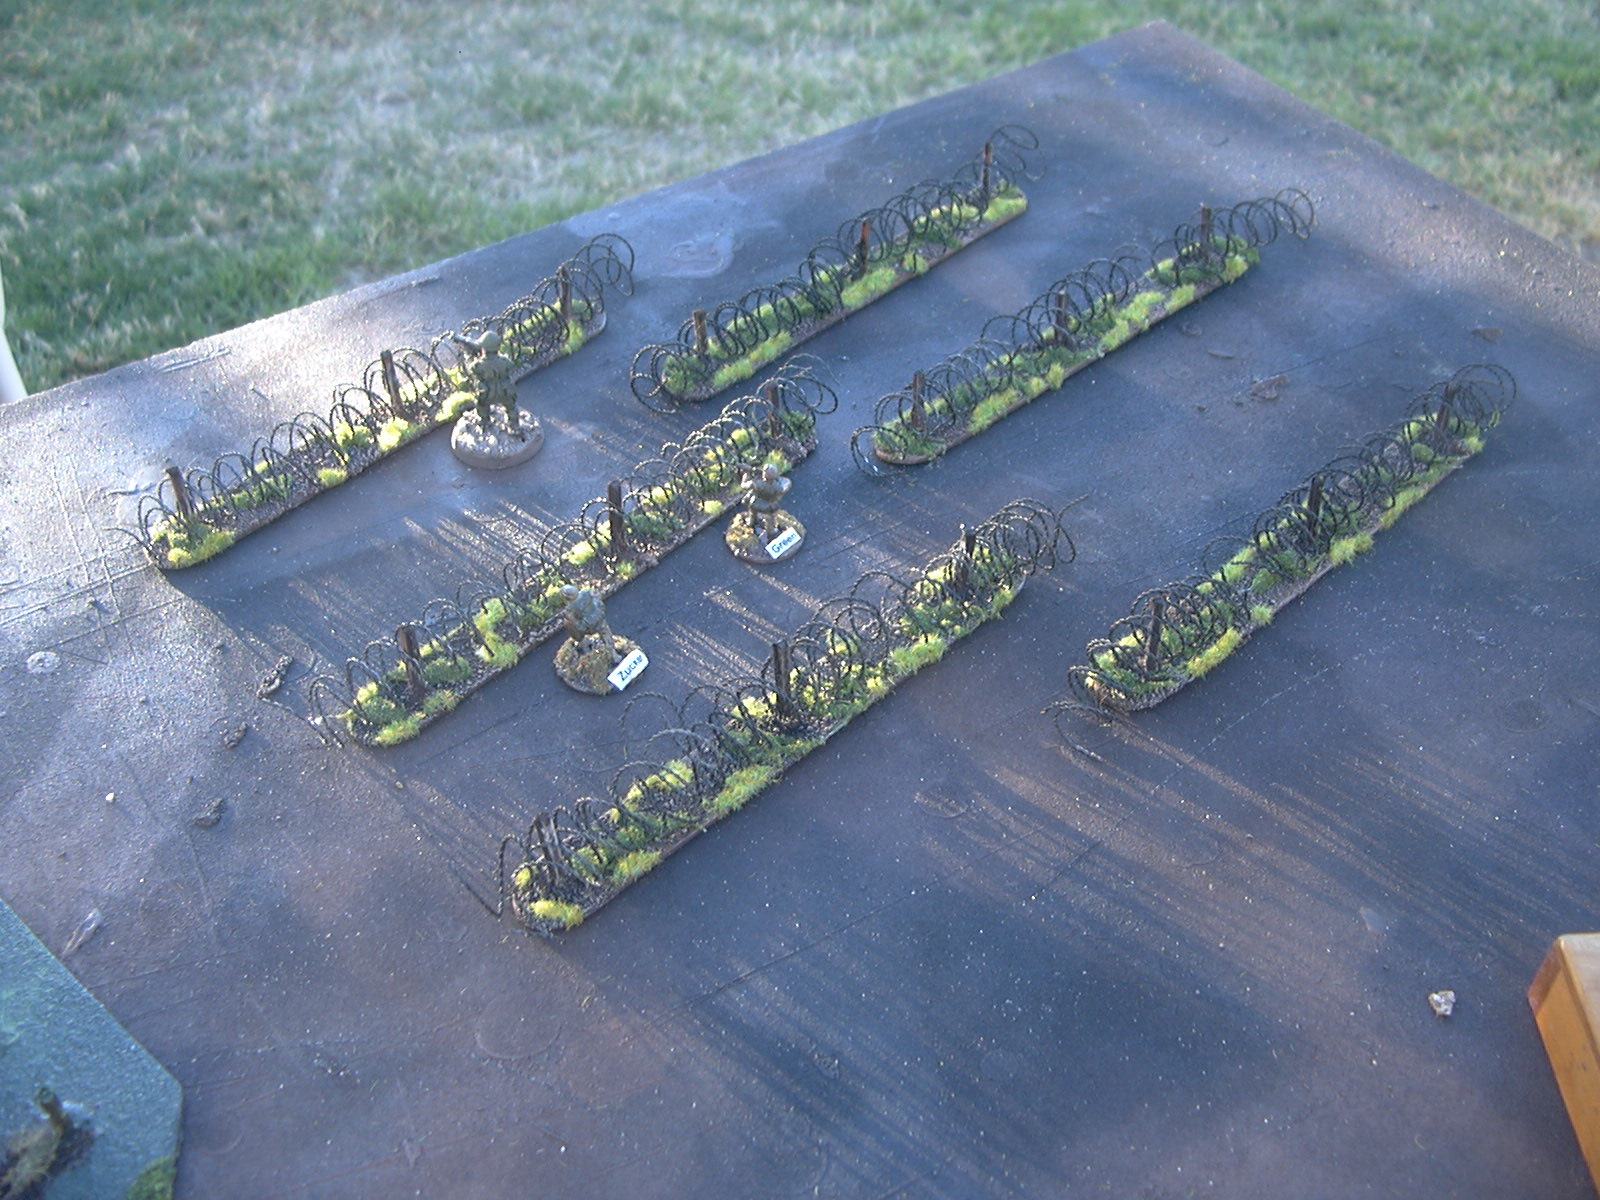 Terrain of War: Barbed Wire 20mm 25mm 28mm (6) 1/72 1/48 40K